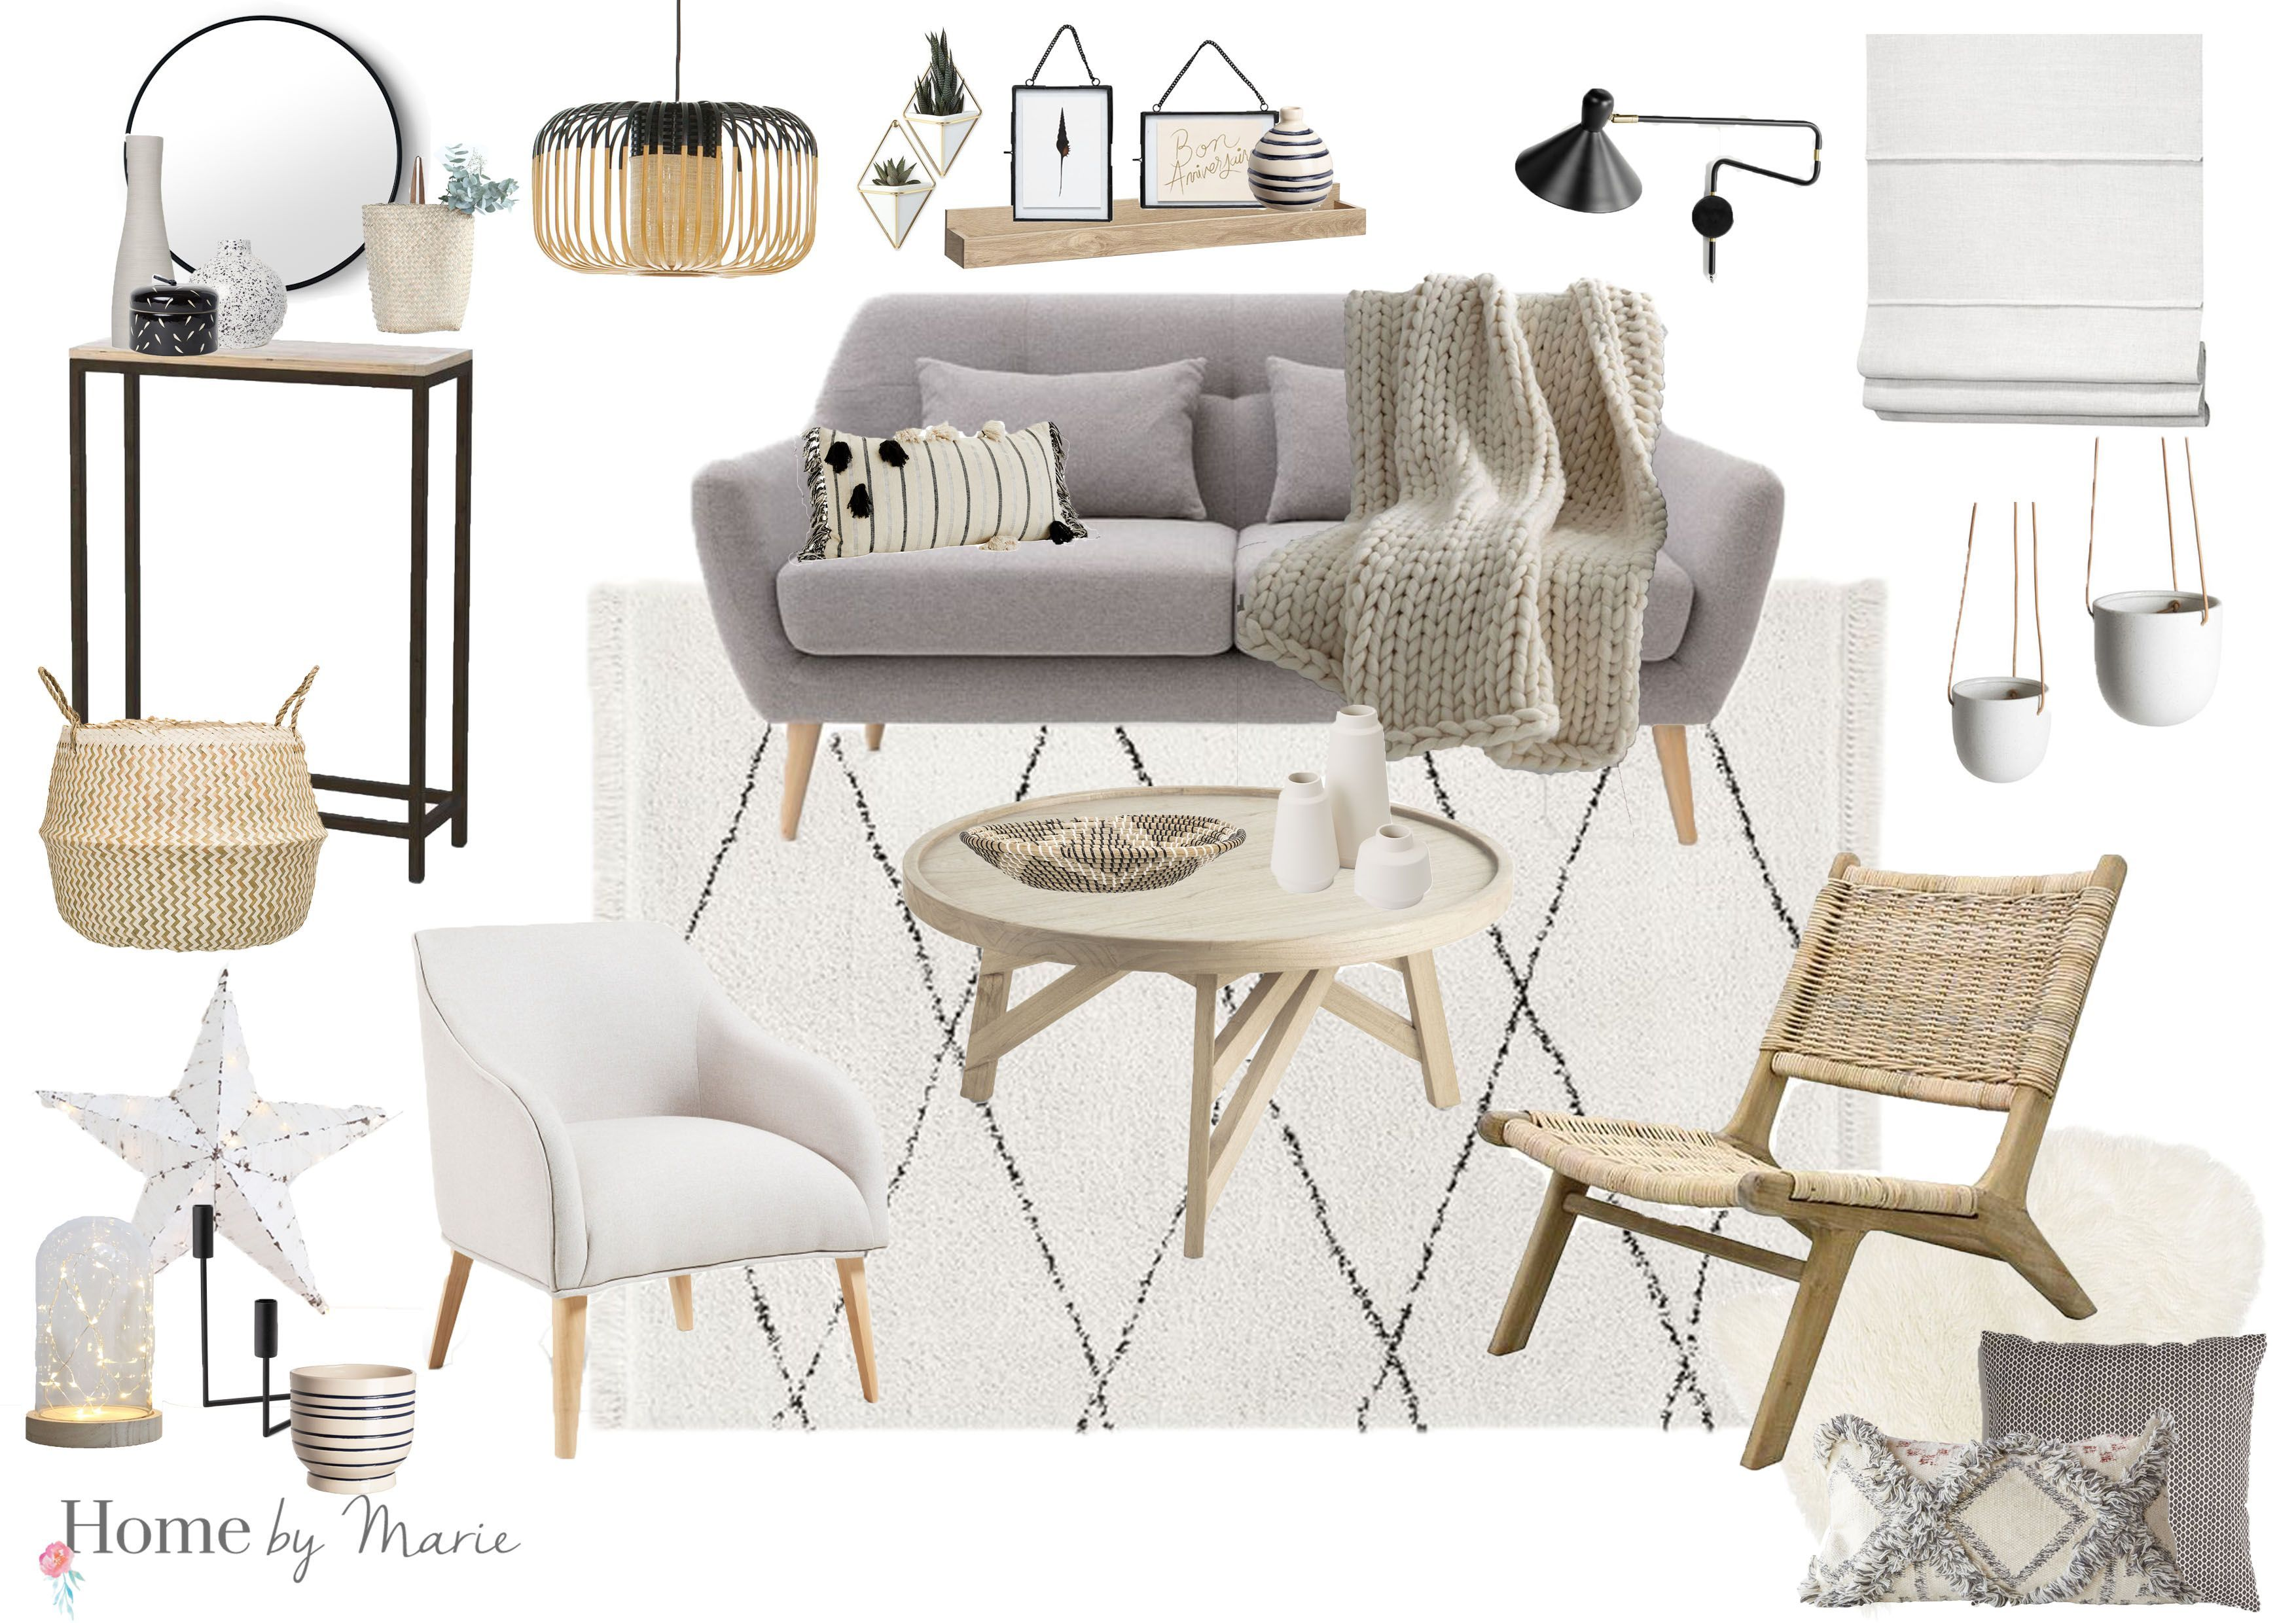 Liste shopping salon scandinave cosy blanc et cocooning ...